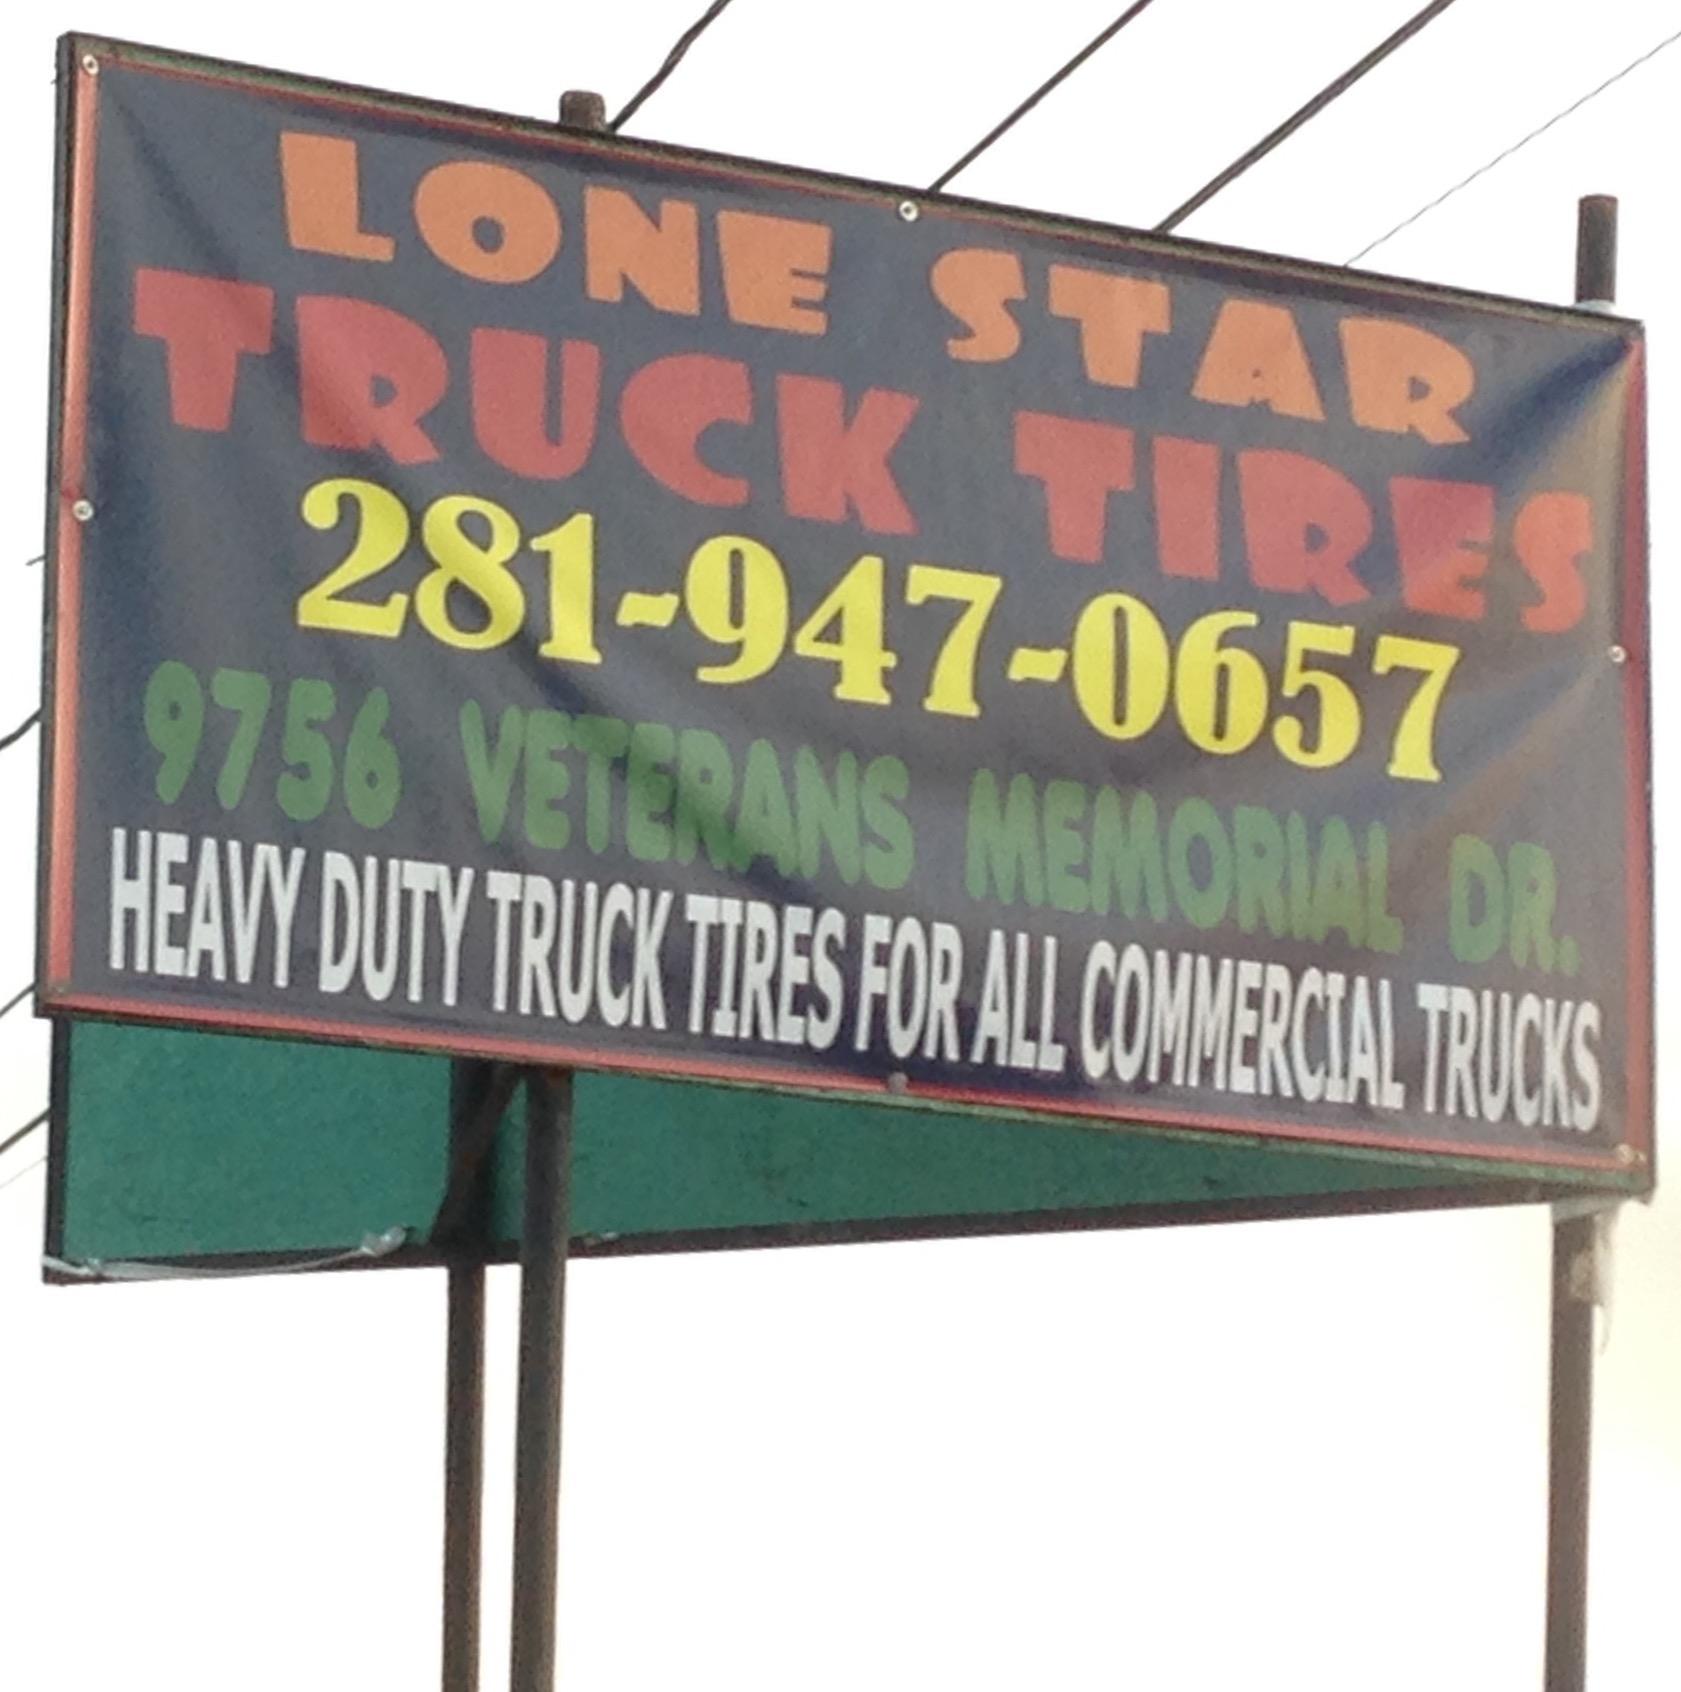 Lone Star Truck Tires in Houston, TX 77038 ...